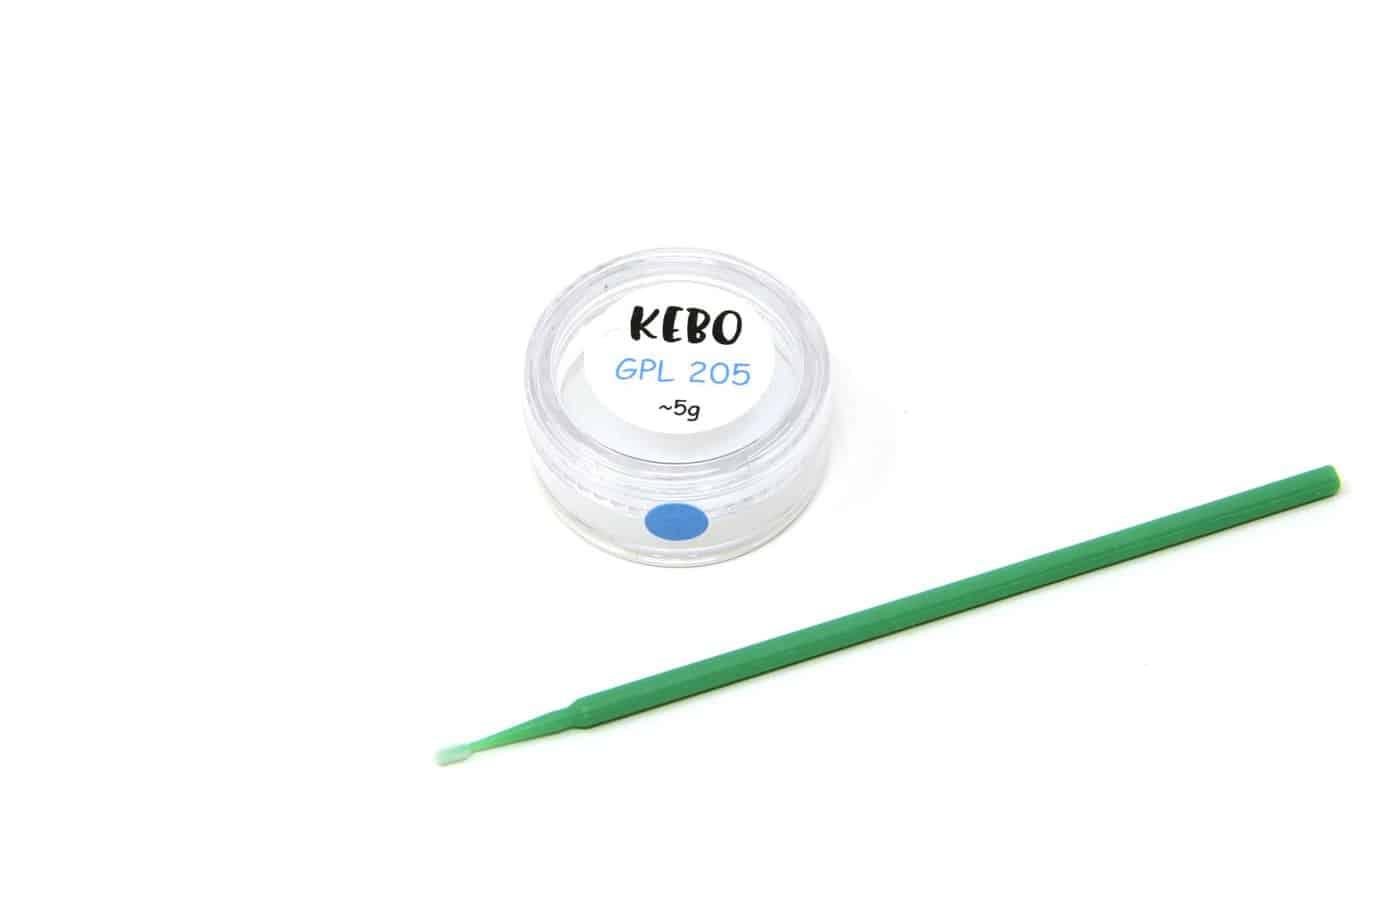 Krytox 205G0 Lubricant